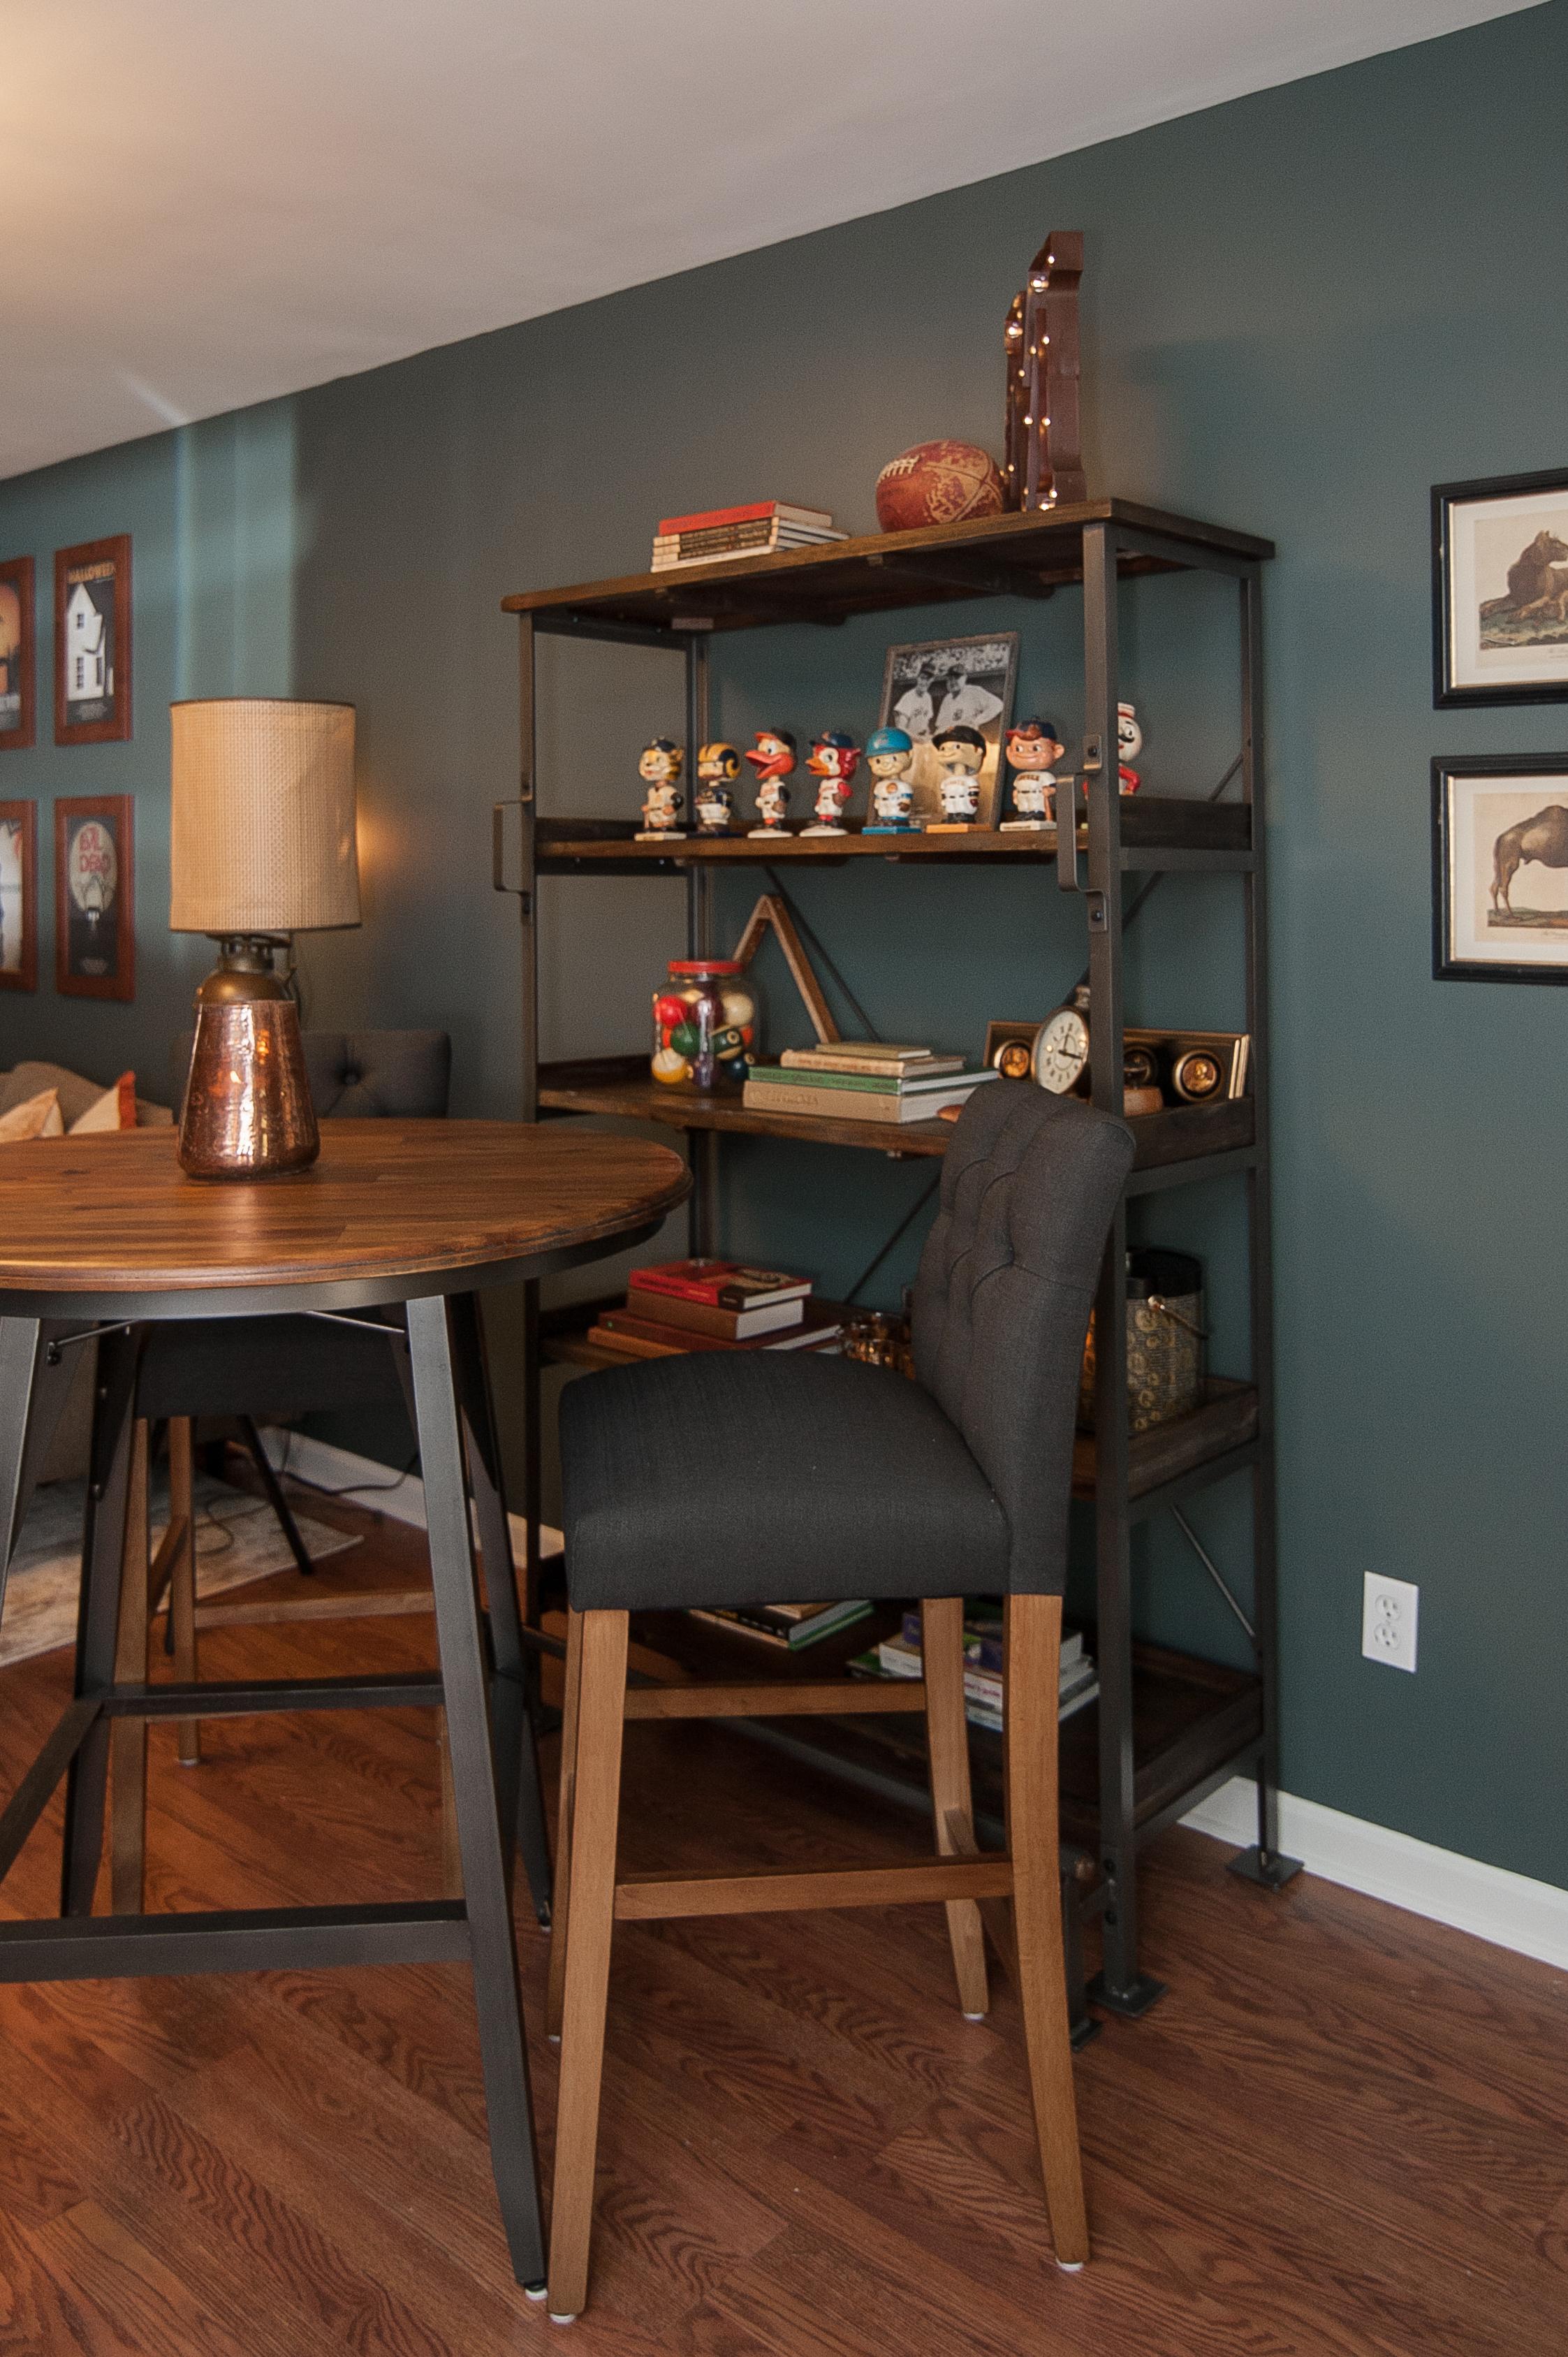 Artful Interiors - Bachelor Pad - Pub Table